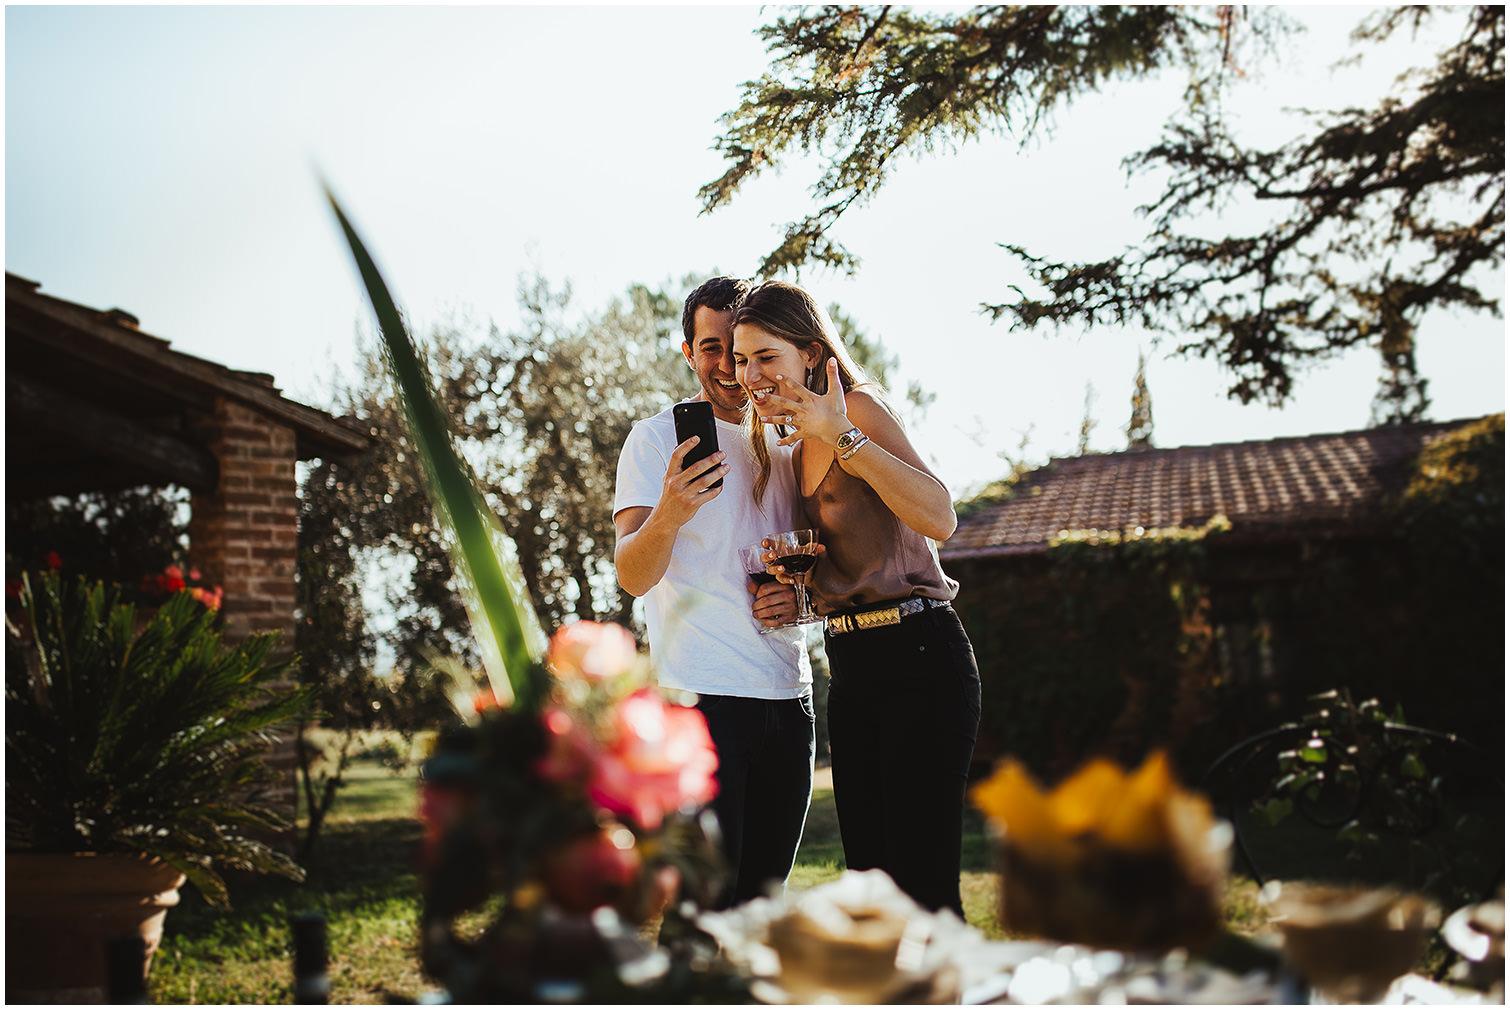 JULIE-JOSH-ENGAGEMENT-SARA-LORENZONI-FOTOGRAFIA-PHOTOGRAPHY-MONTEPULCIANO-TUSCANY19